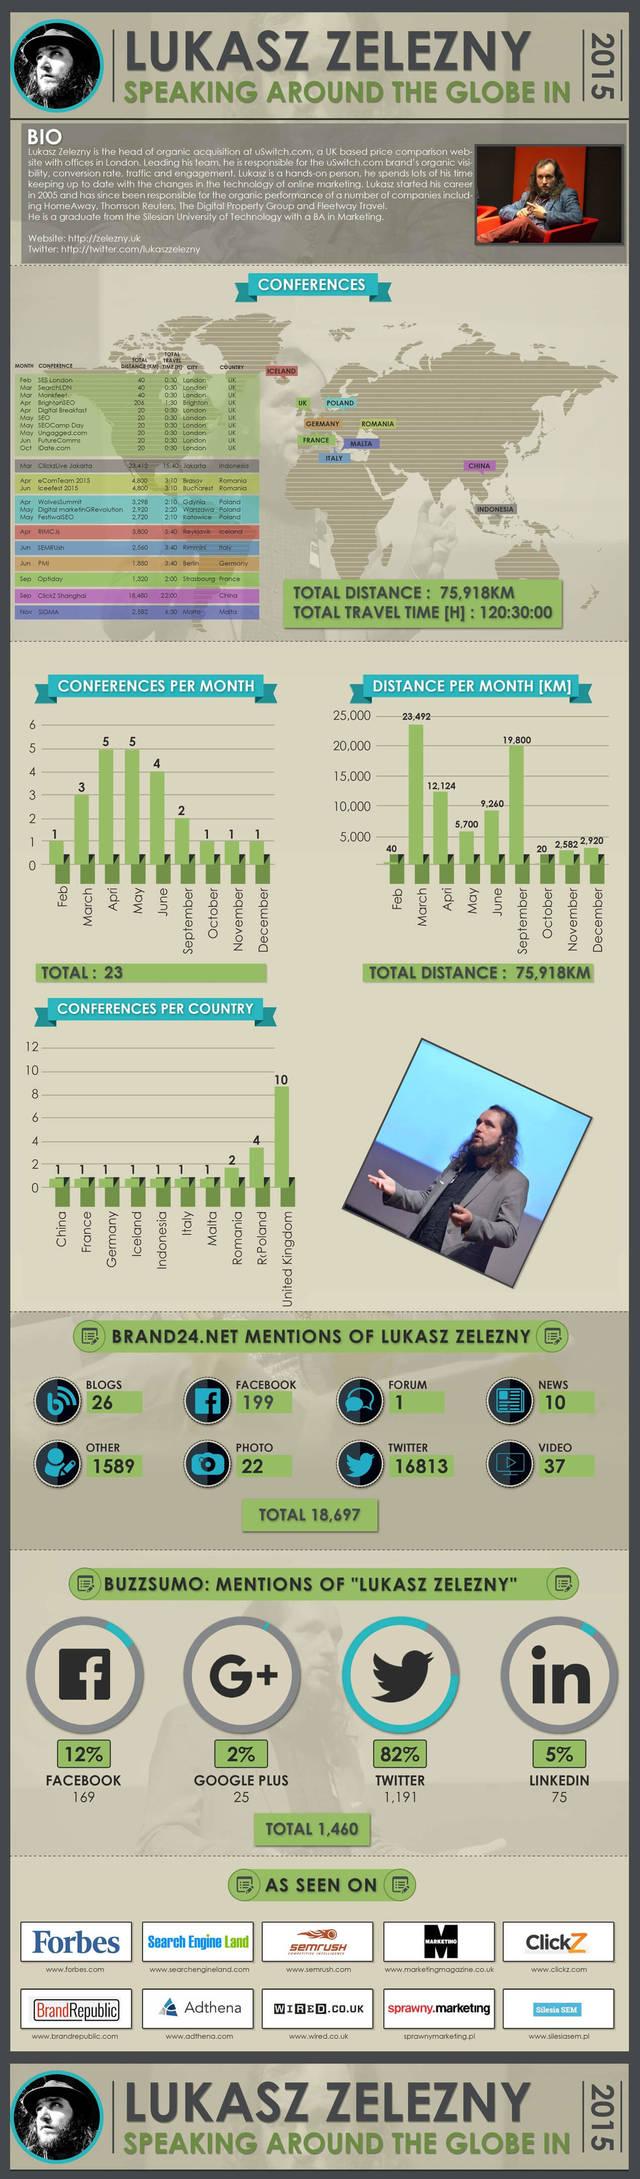 Lukaszzelezny speaking around the globe conferences 2015 infographic1